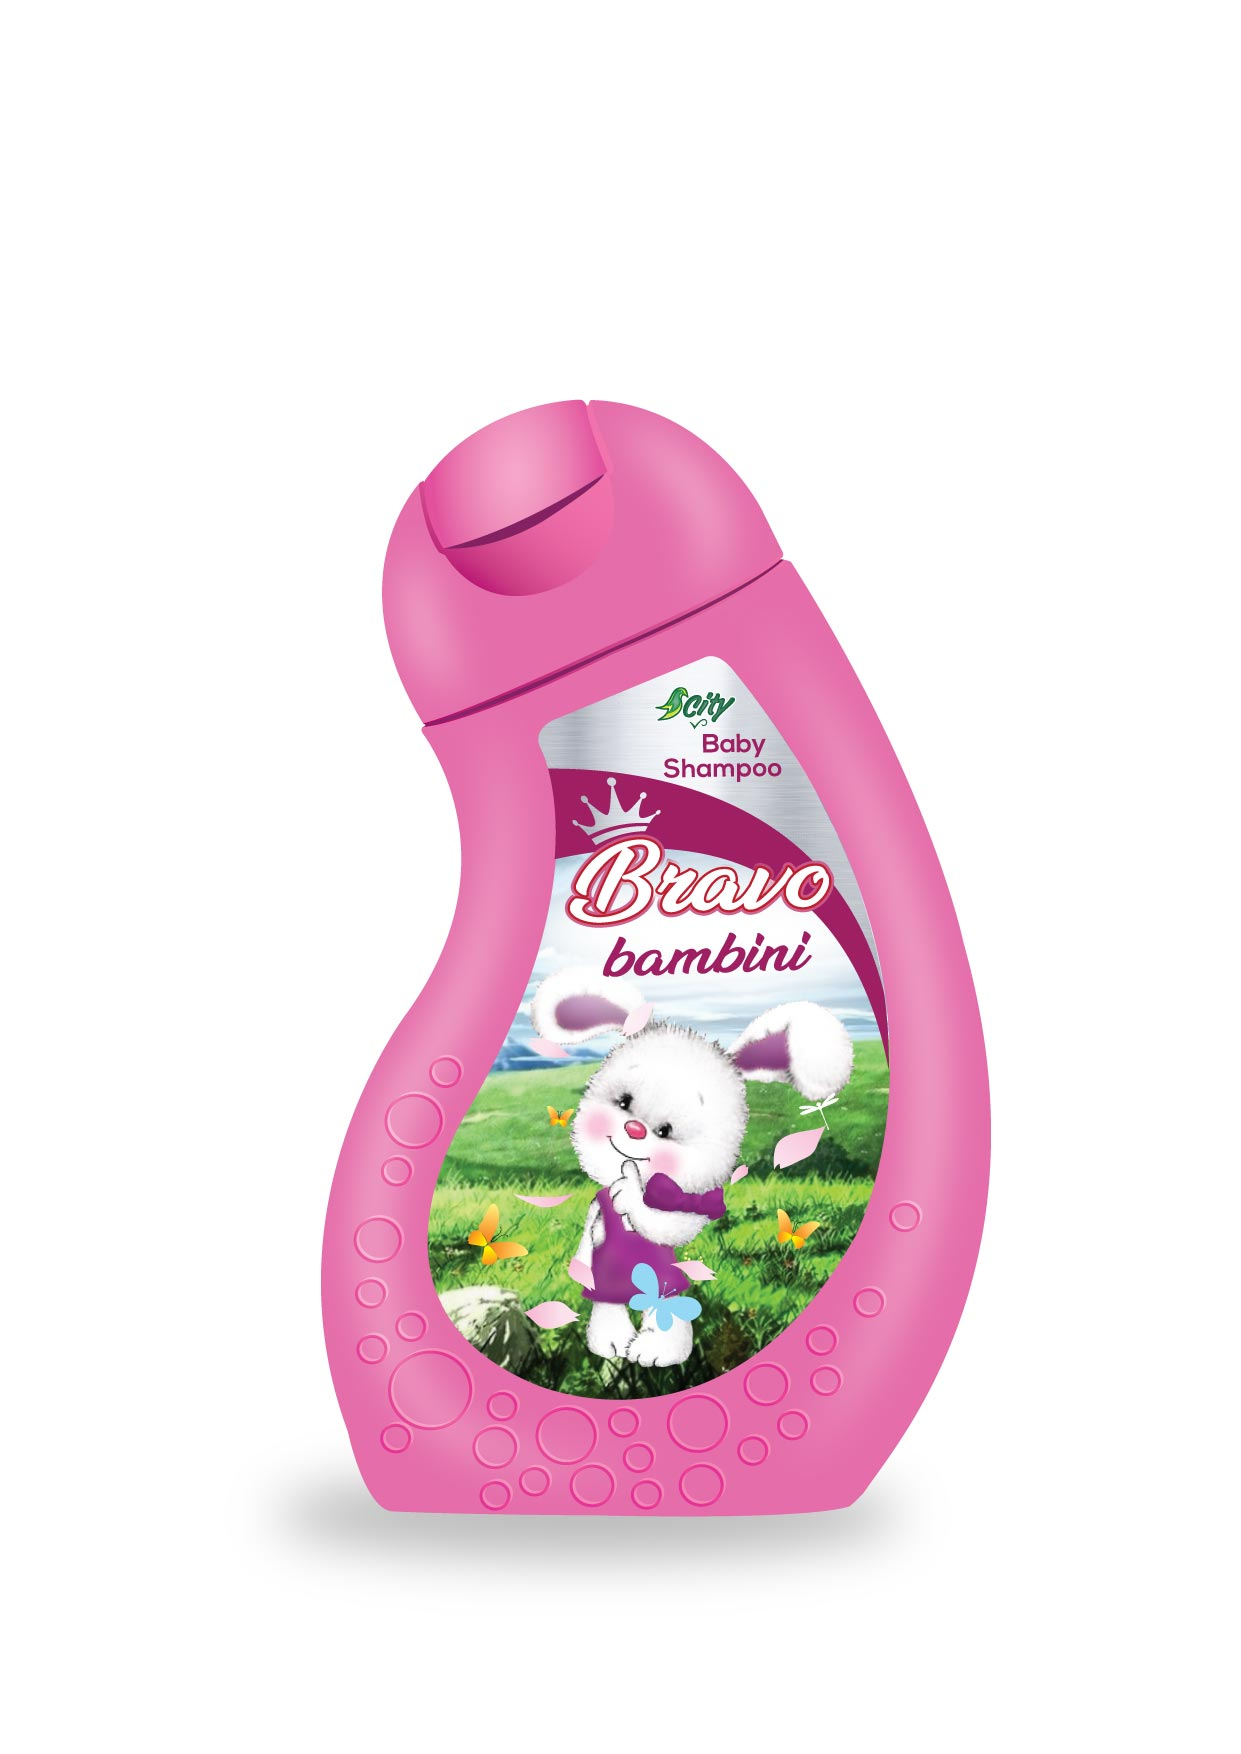 Bravo-Bambini-baby-shampoo-01